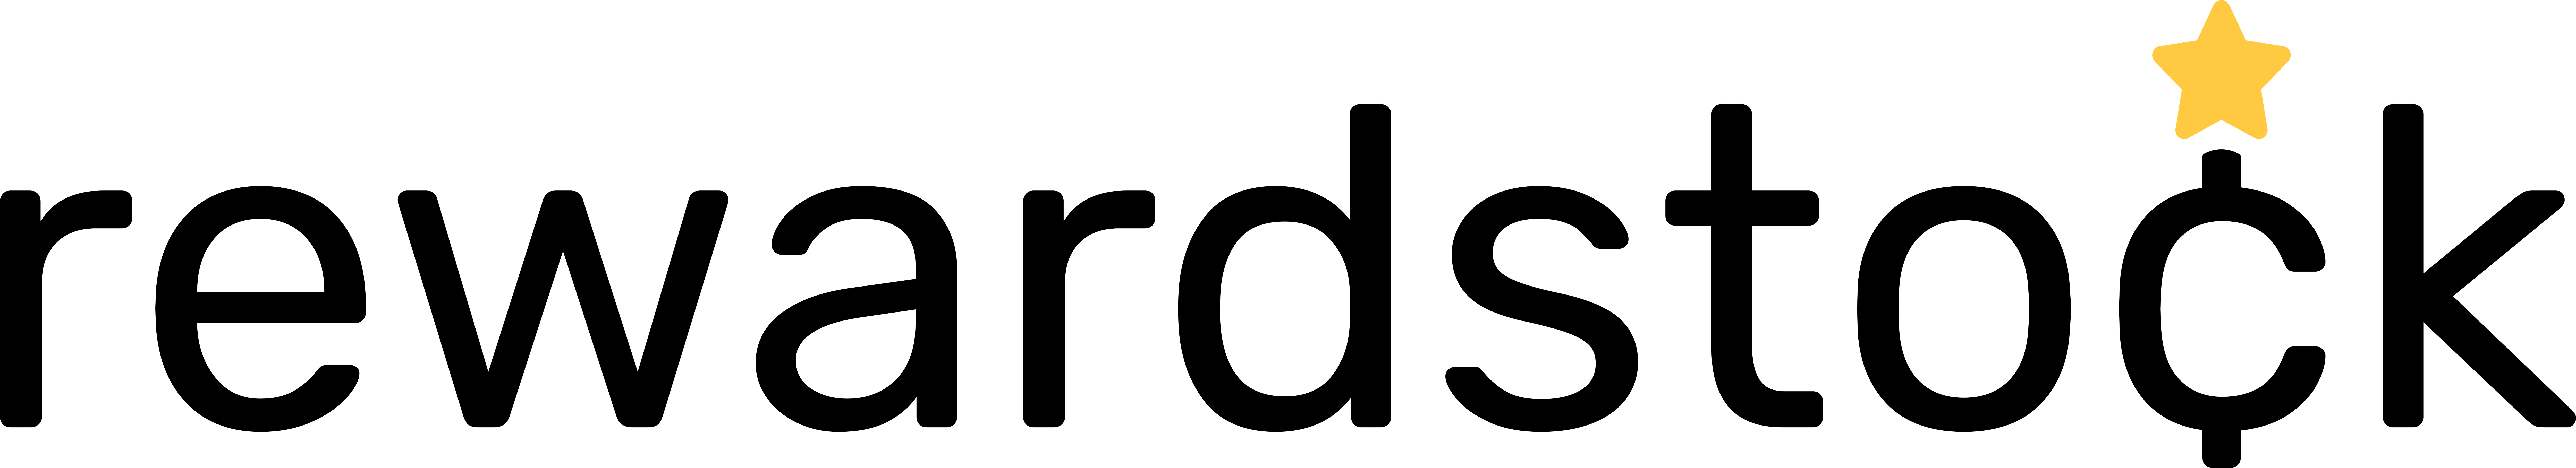 RewardStock Logo